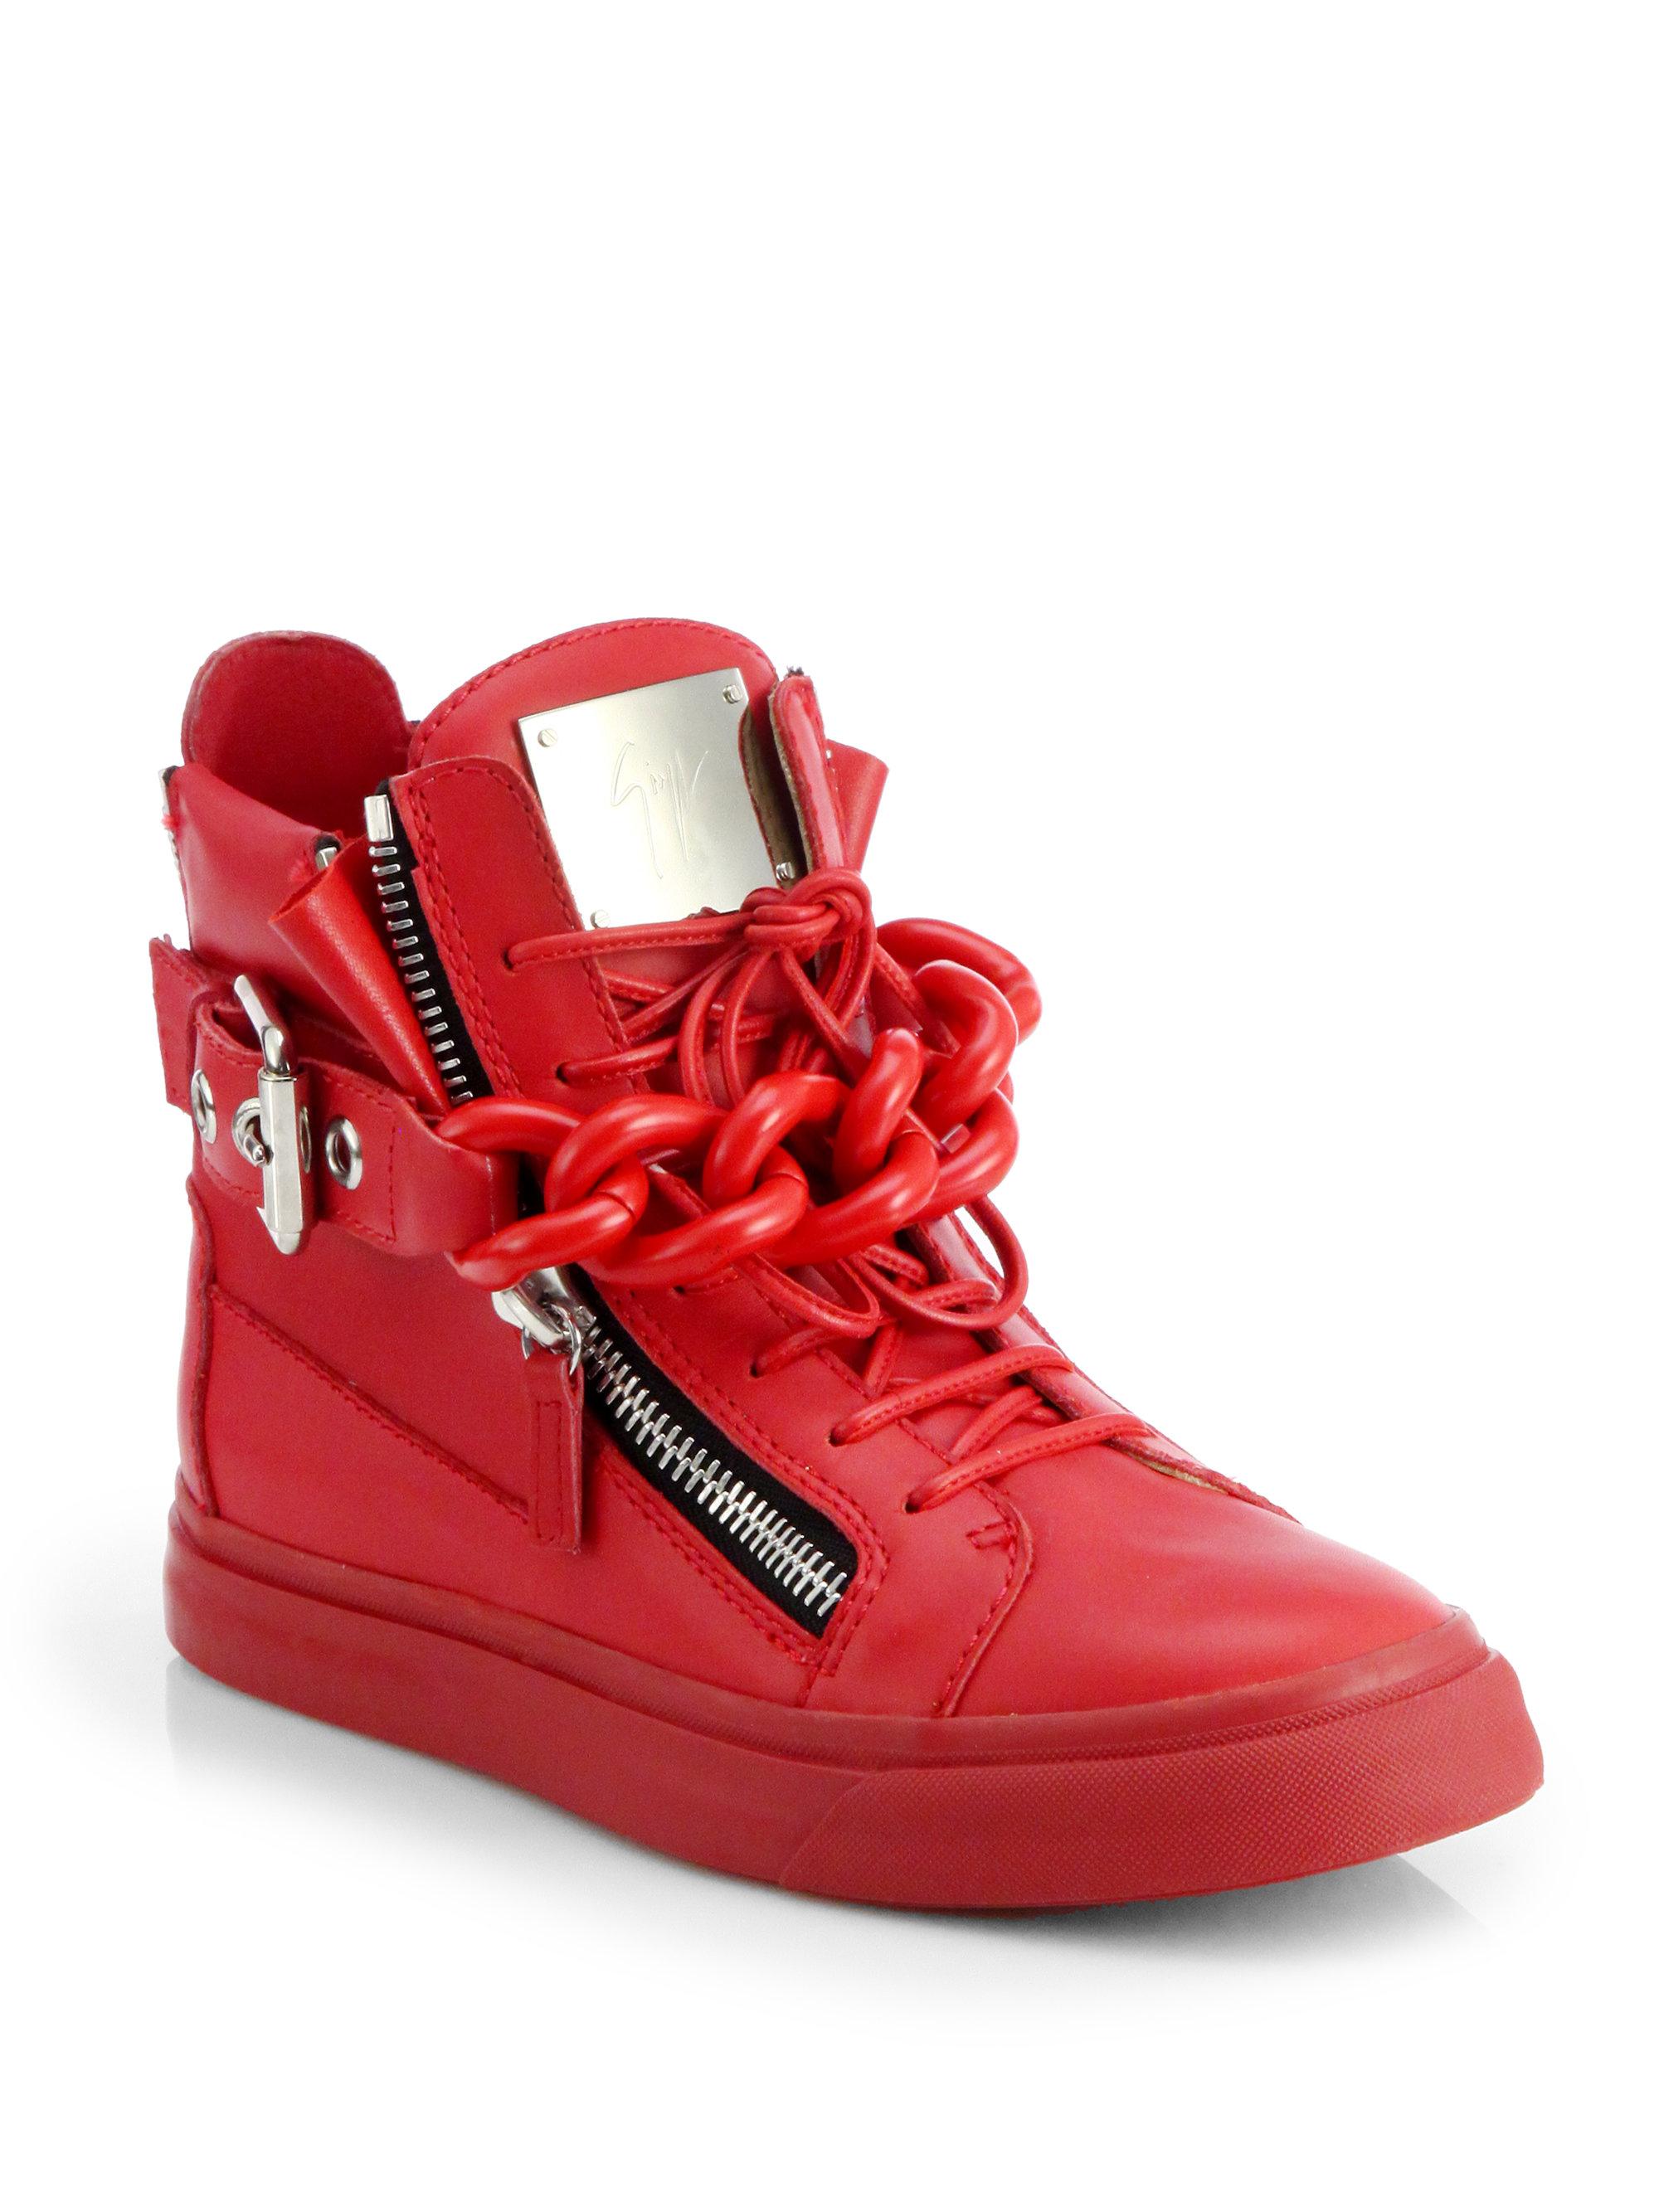 840ac8e93f20b Giuseppe Zanotti Tonal Chain Sneakers in Red - Lyst